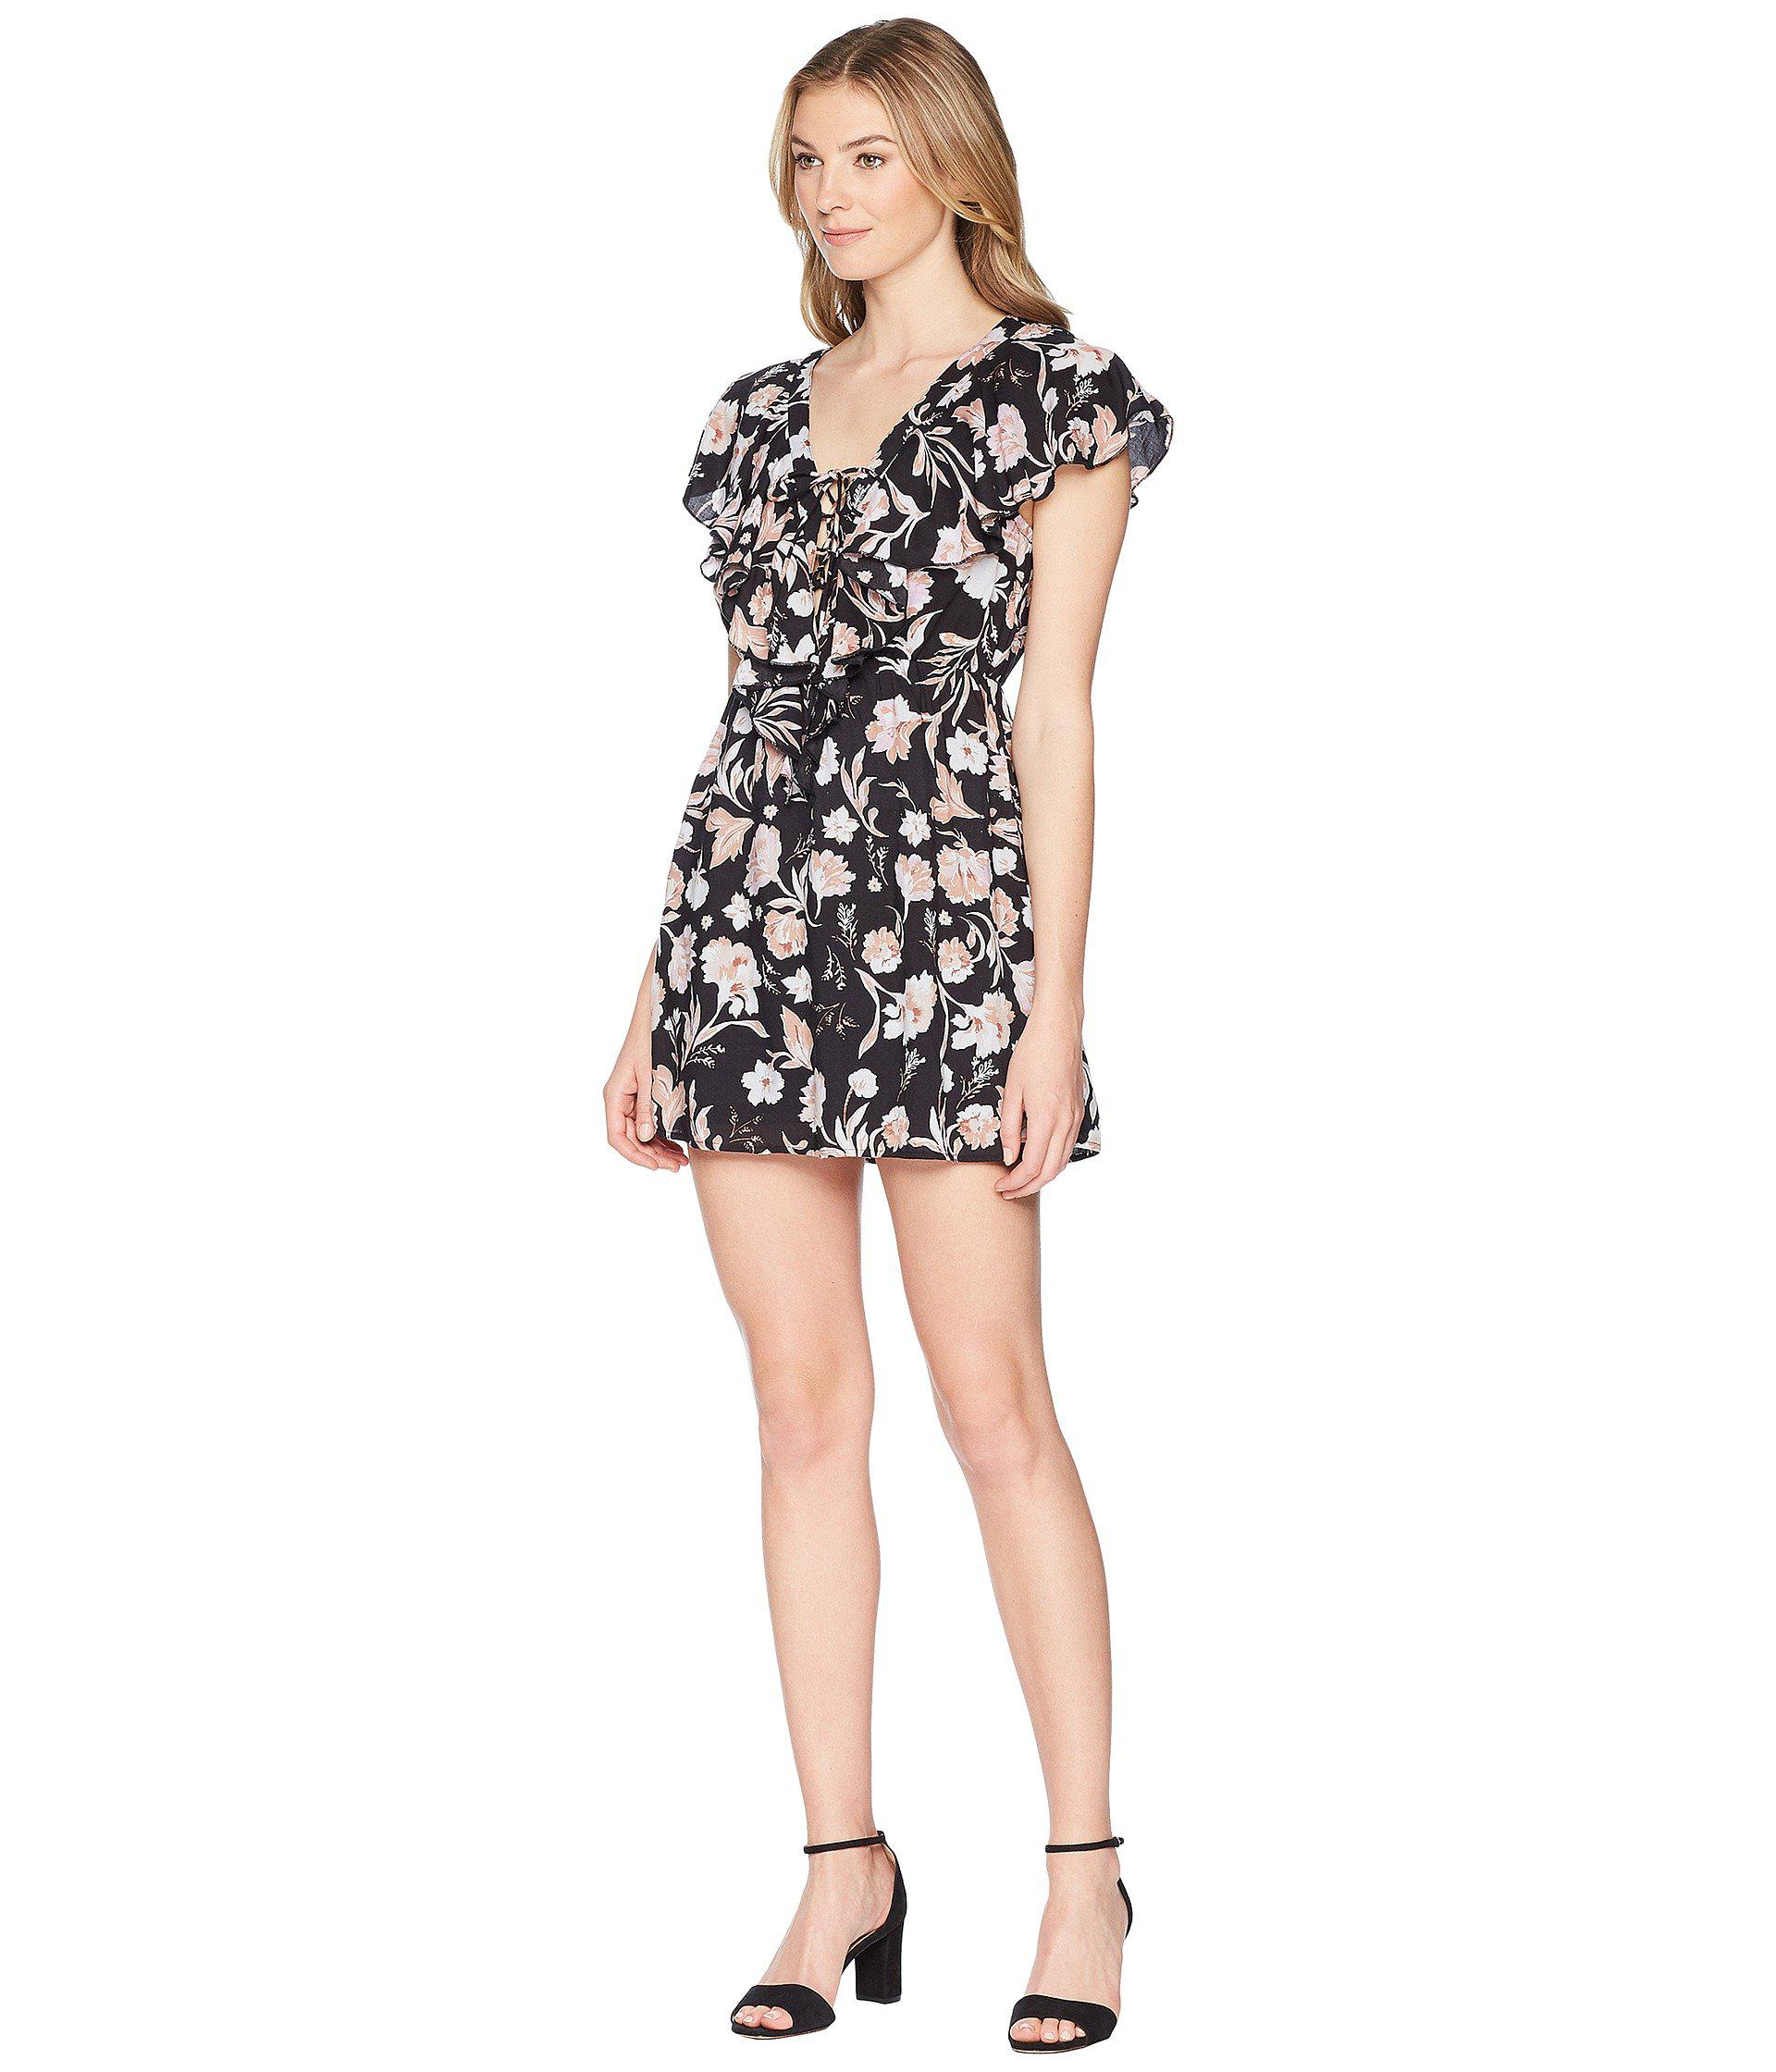 c849665adc31b7 Amuse Society Play Nice Dress in Black - Save 53% - Lyst